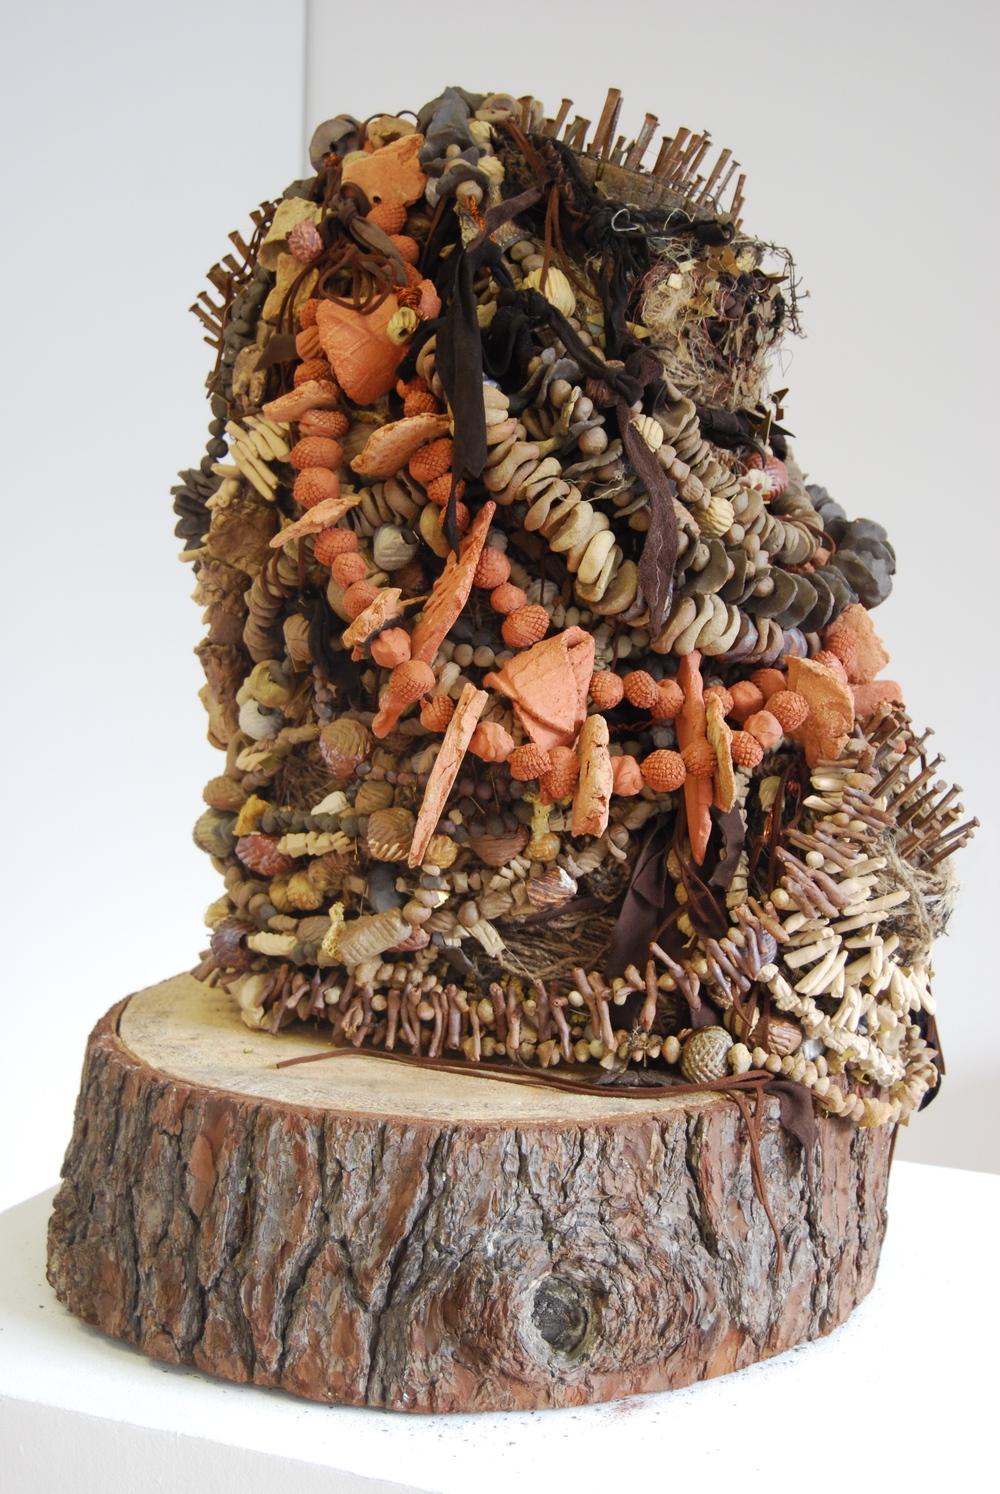 """The Offering III"" "" Ceramic mixed media sculpture by Shelita Birchett Benash, 2015."